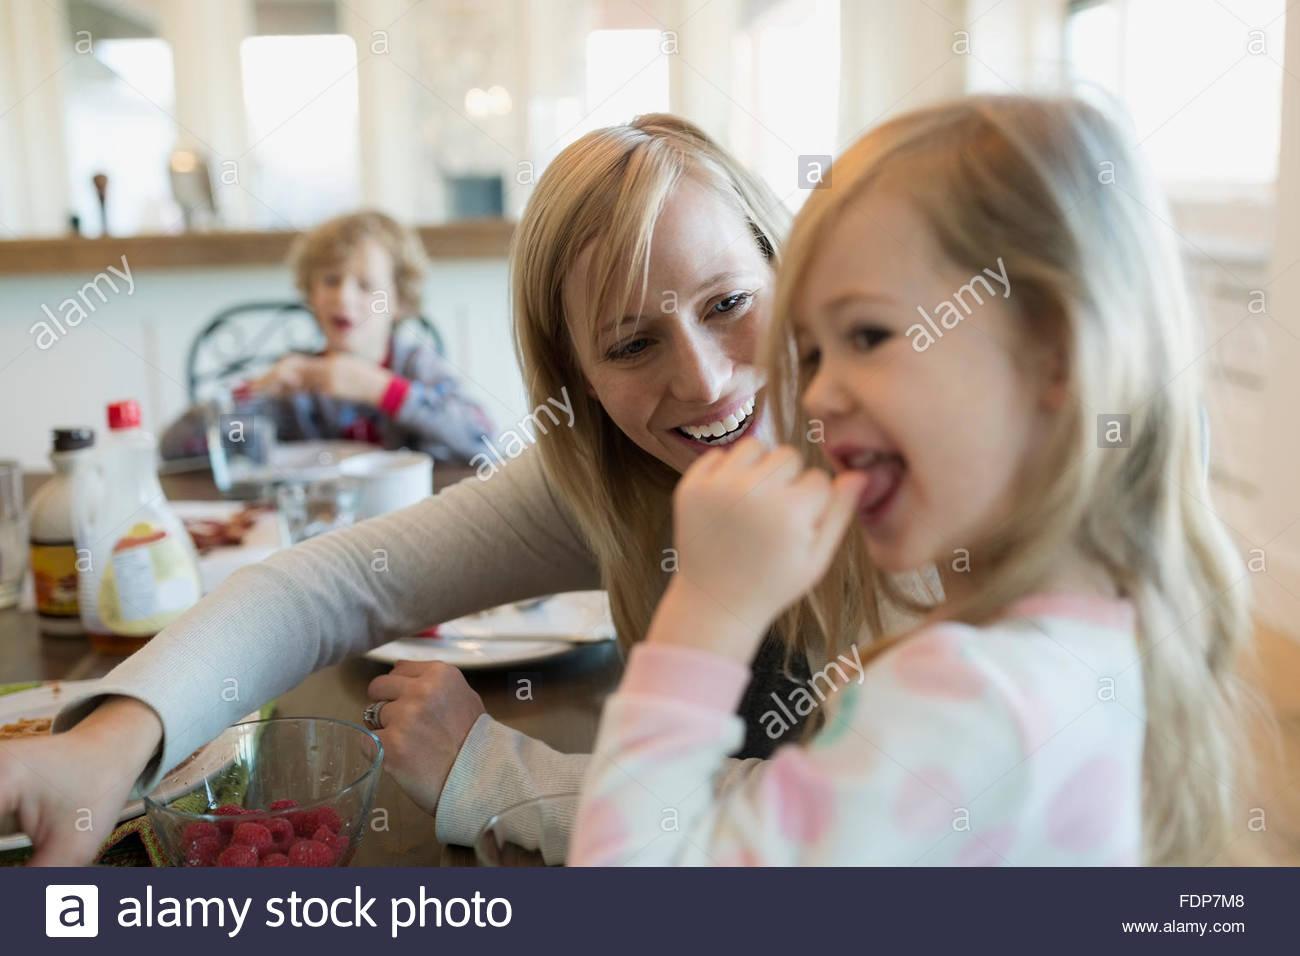 Madre e hija comer frambuesas en mesa de desayuno Imagen De Stock